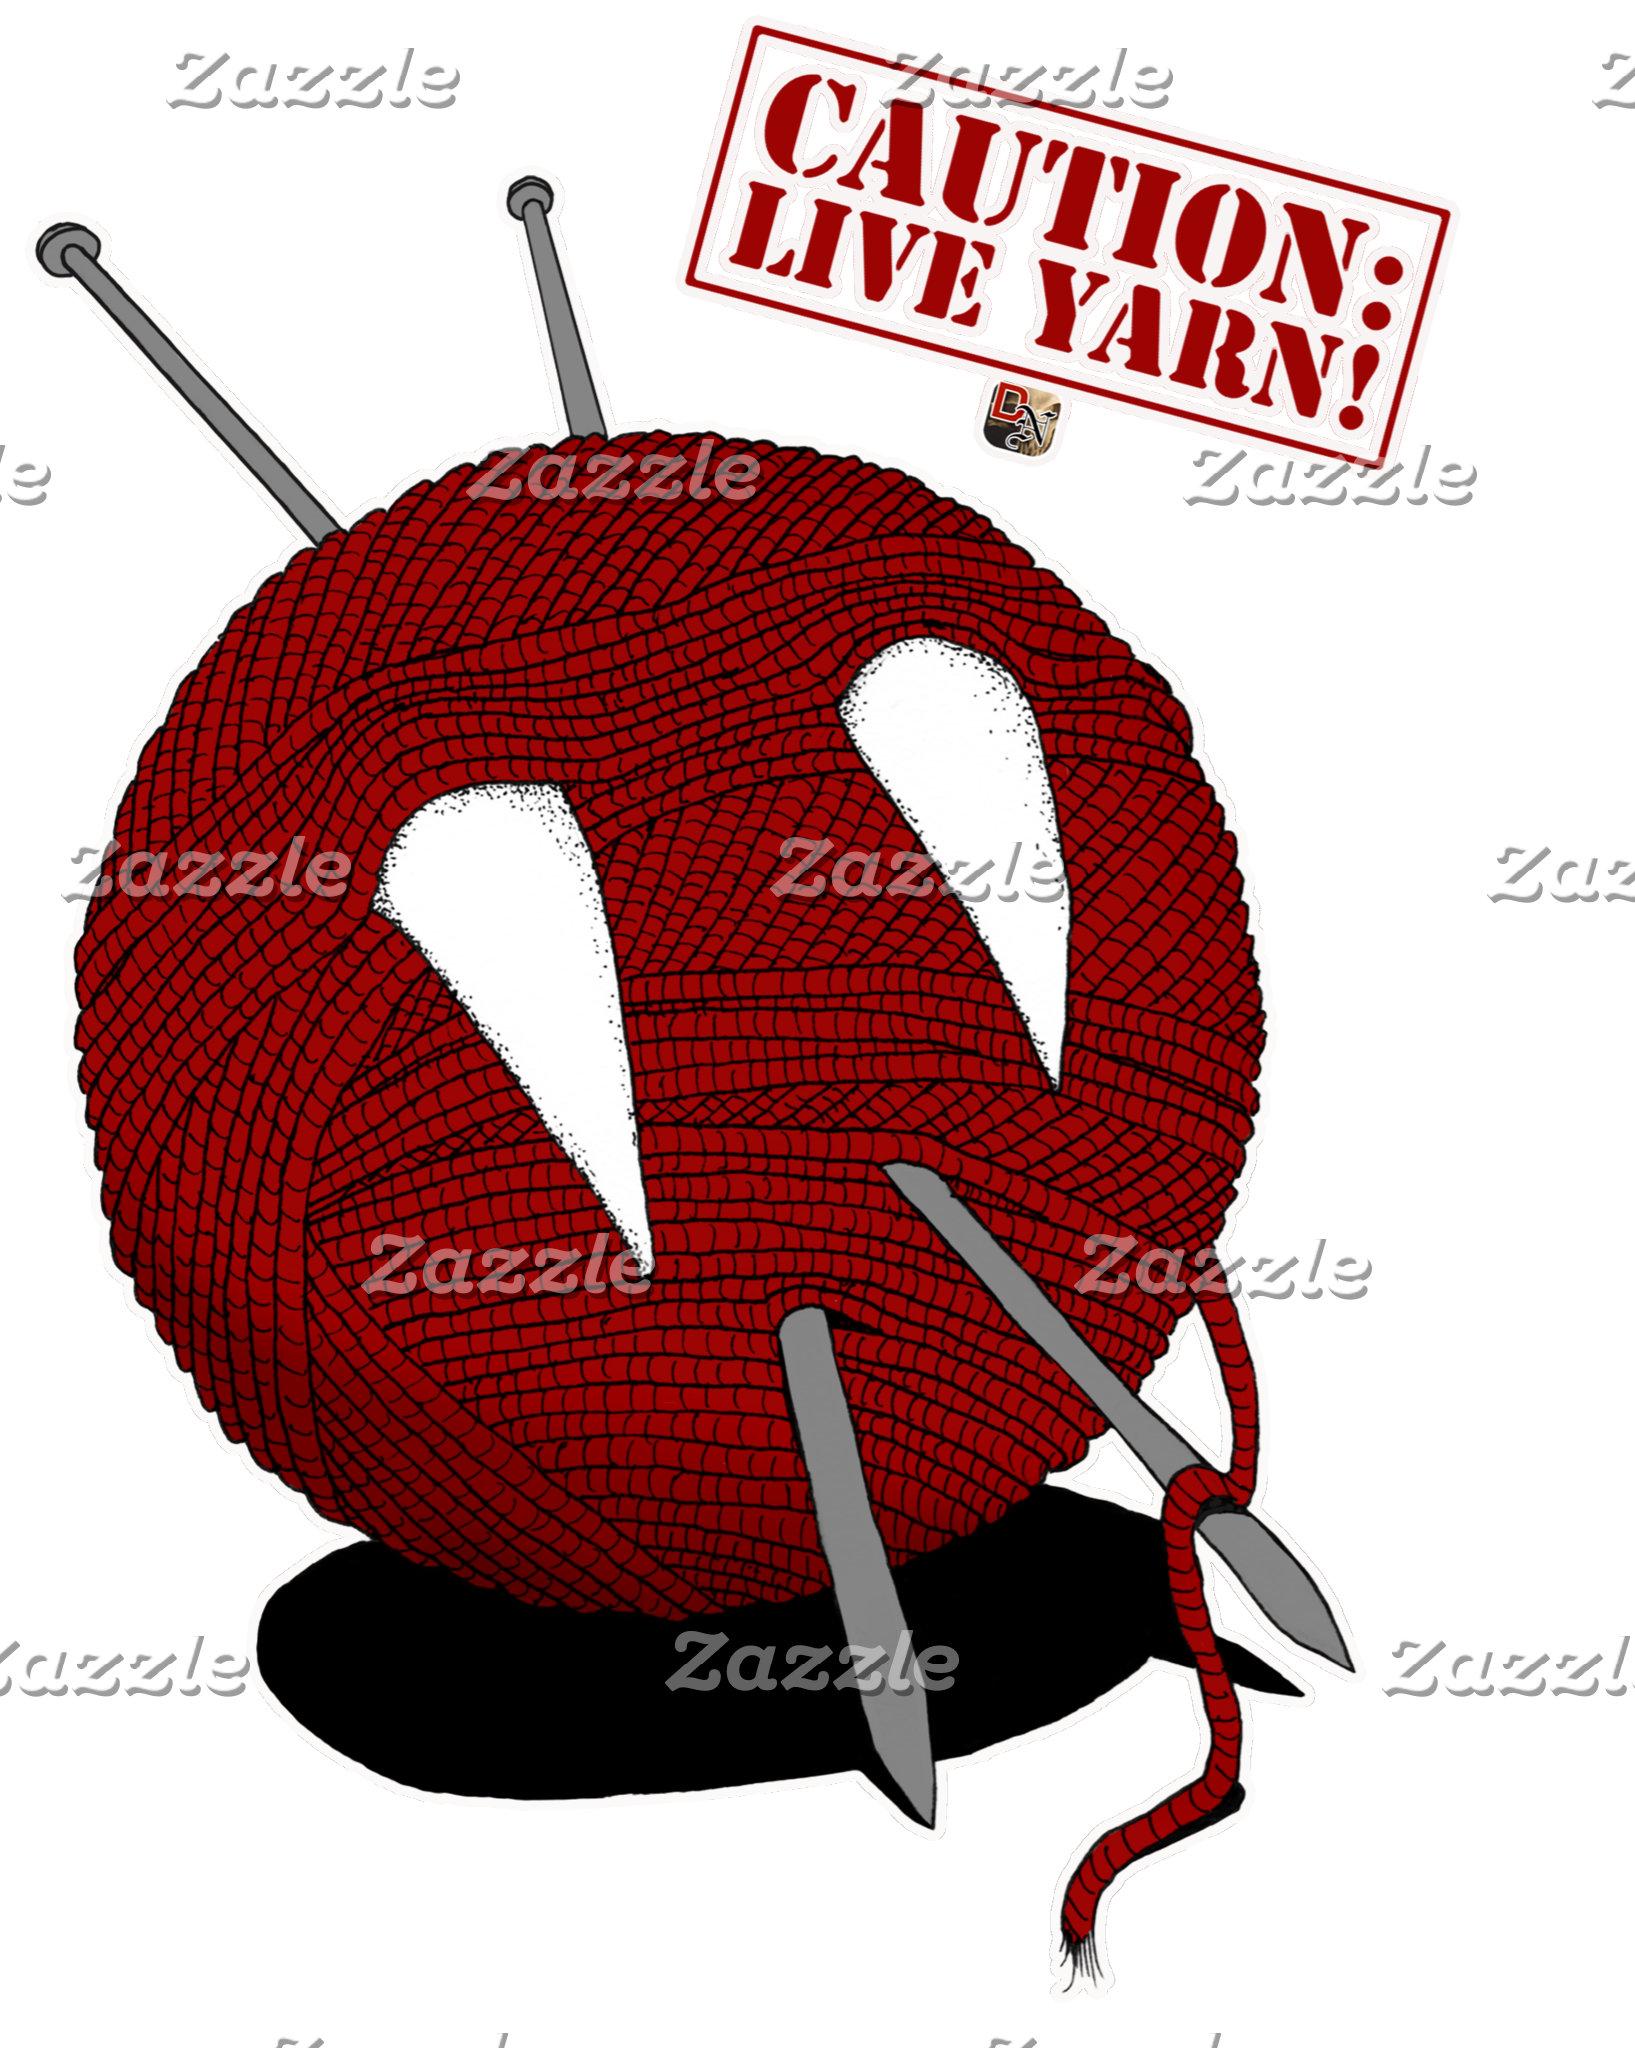 Caution: Live Yarn! Fangs